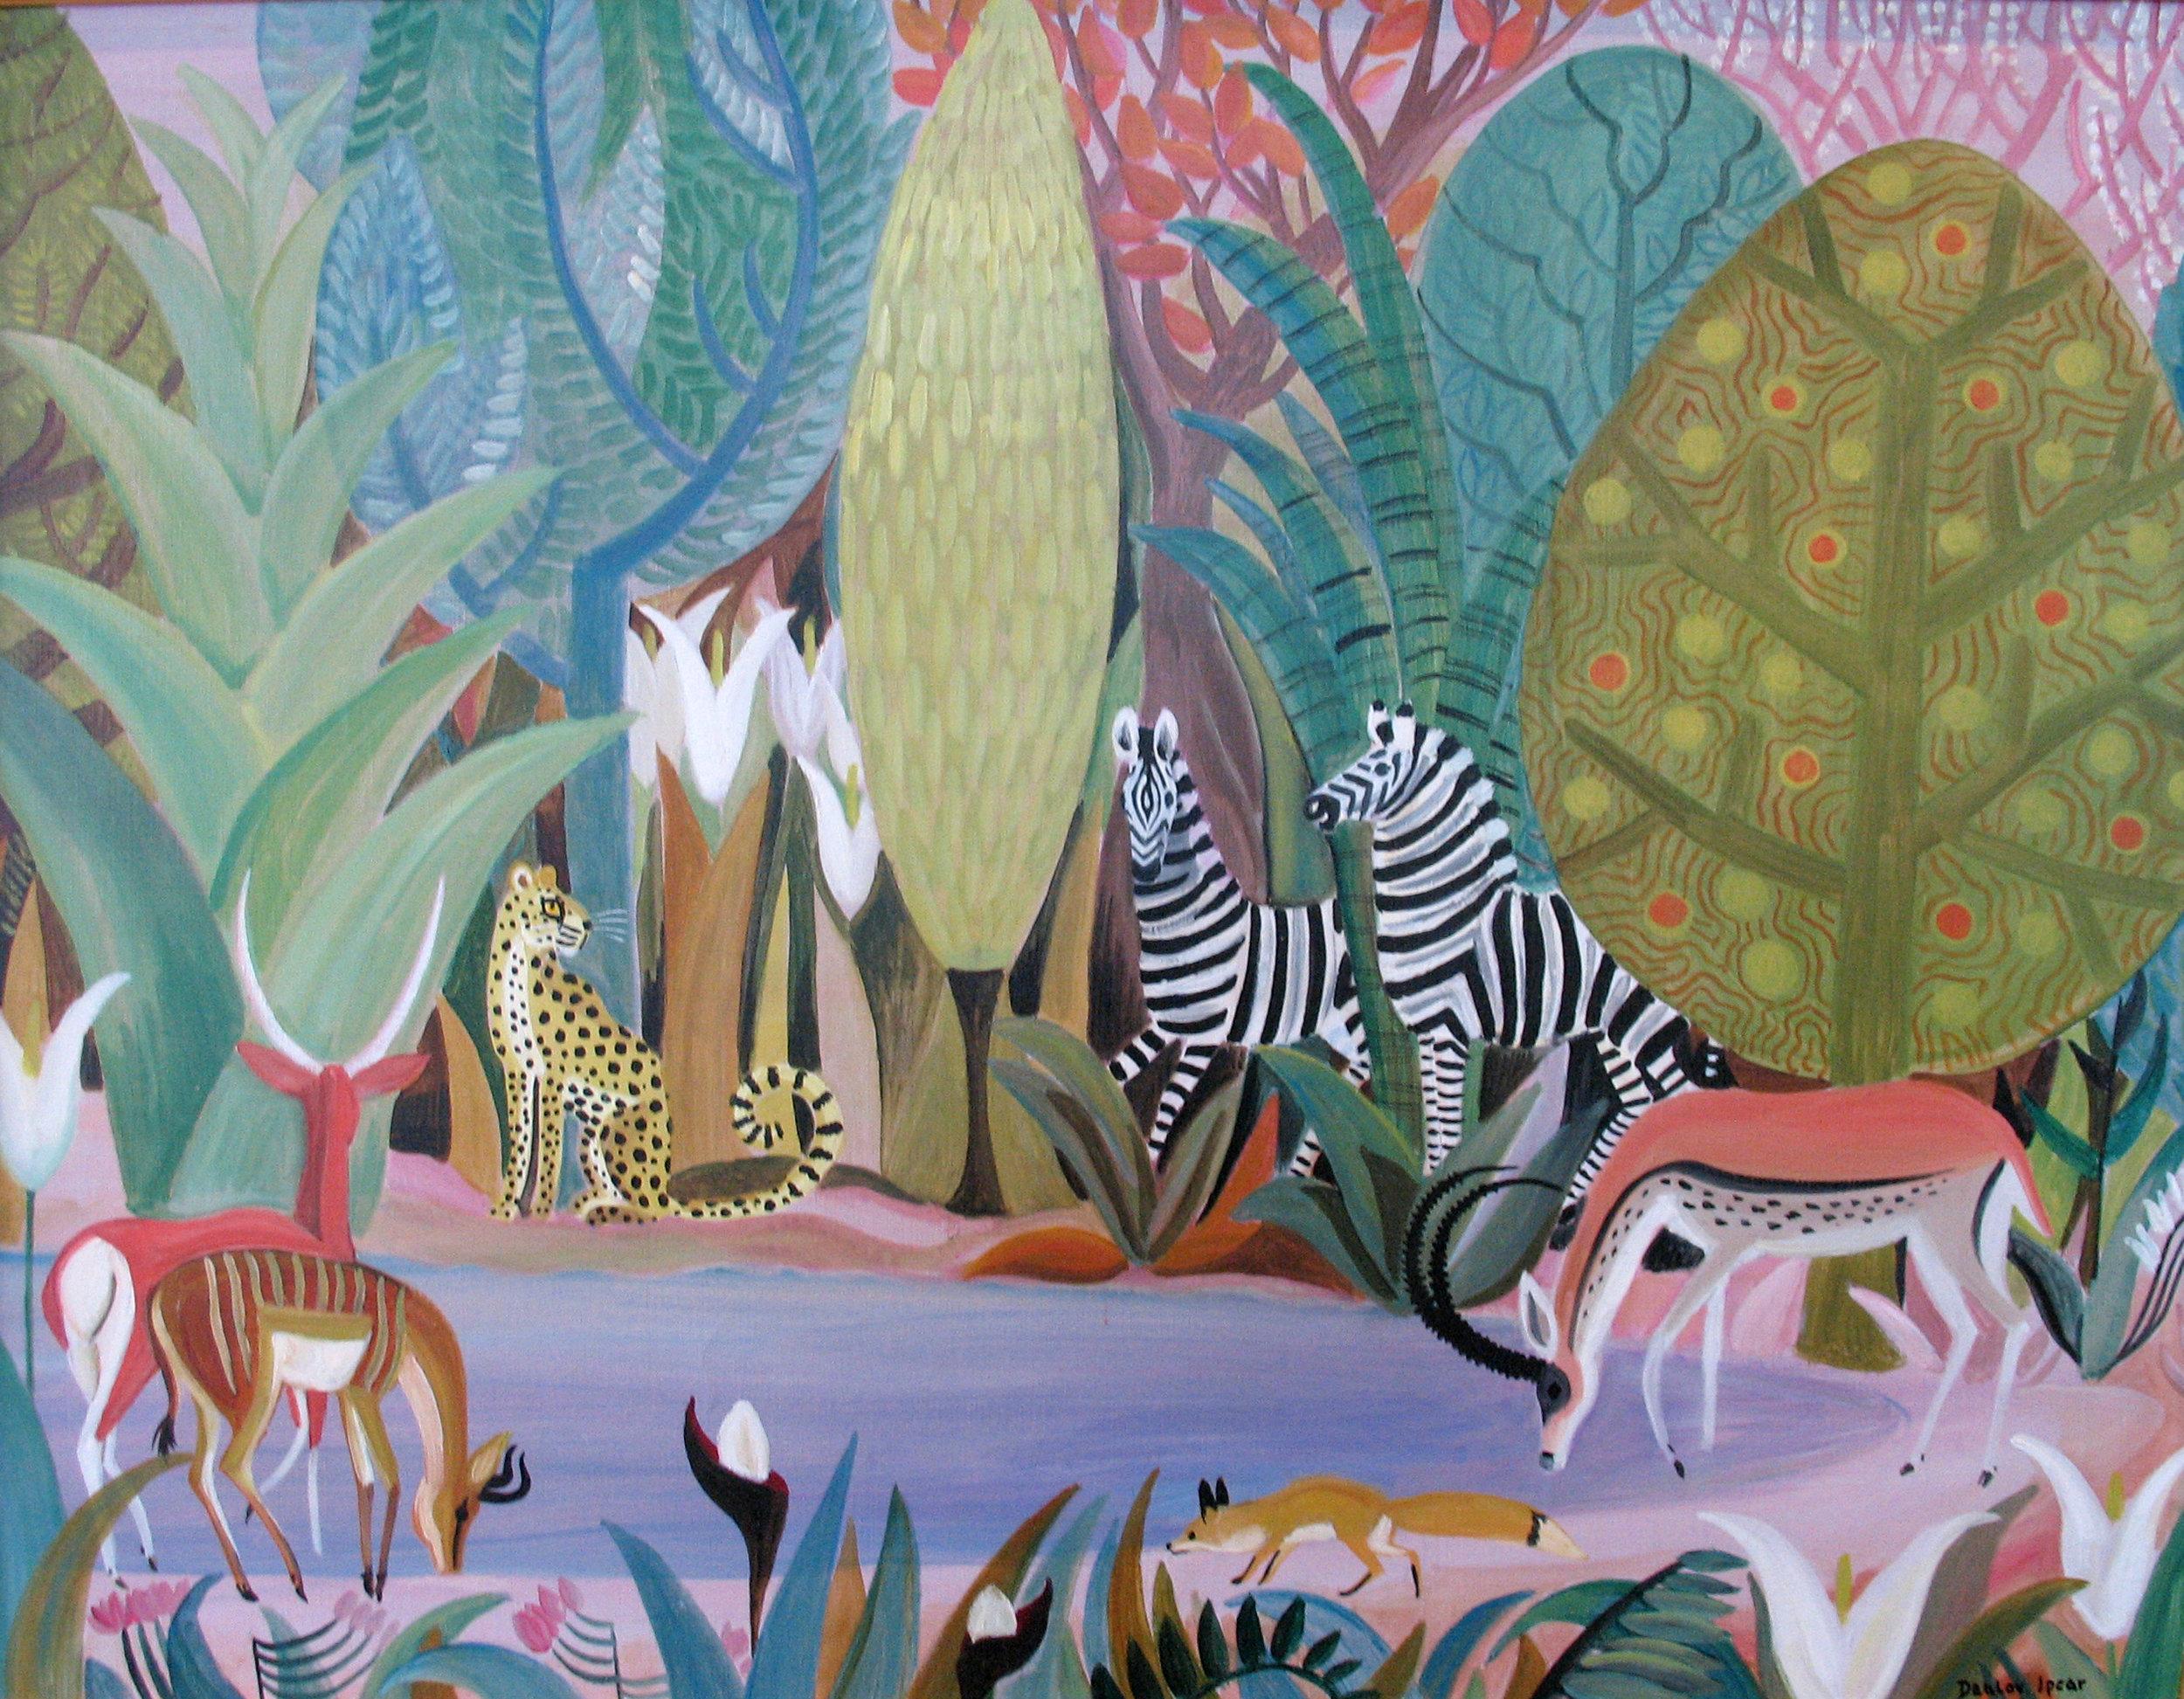 Jungle Pool, Dahlov Ipcar, 1965